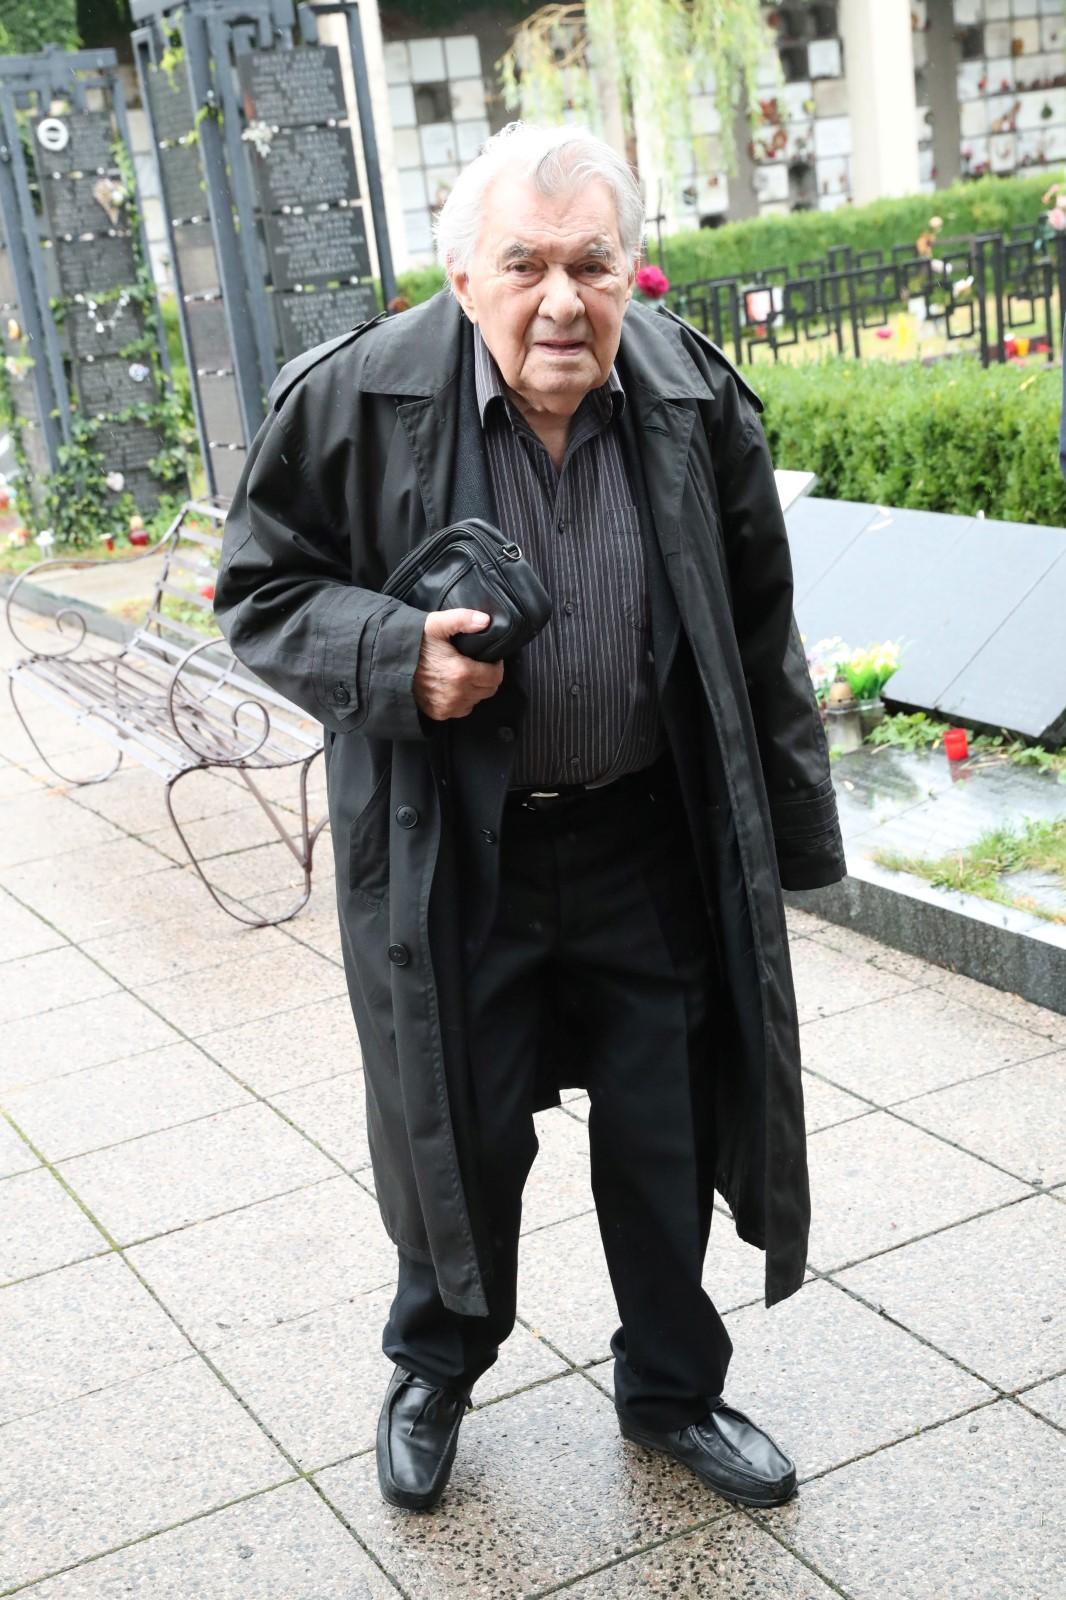 Pohřeb Jana Skopečka: Ladislav Trojan